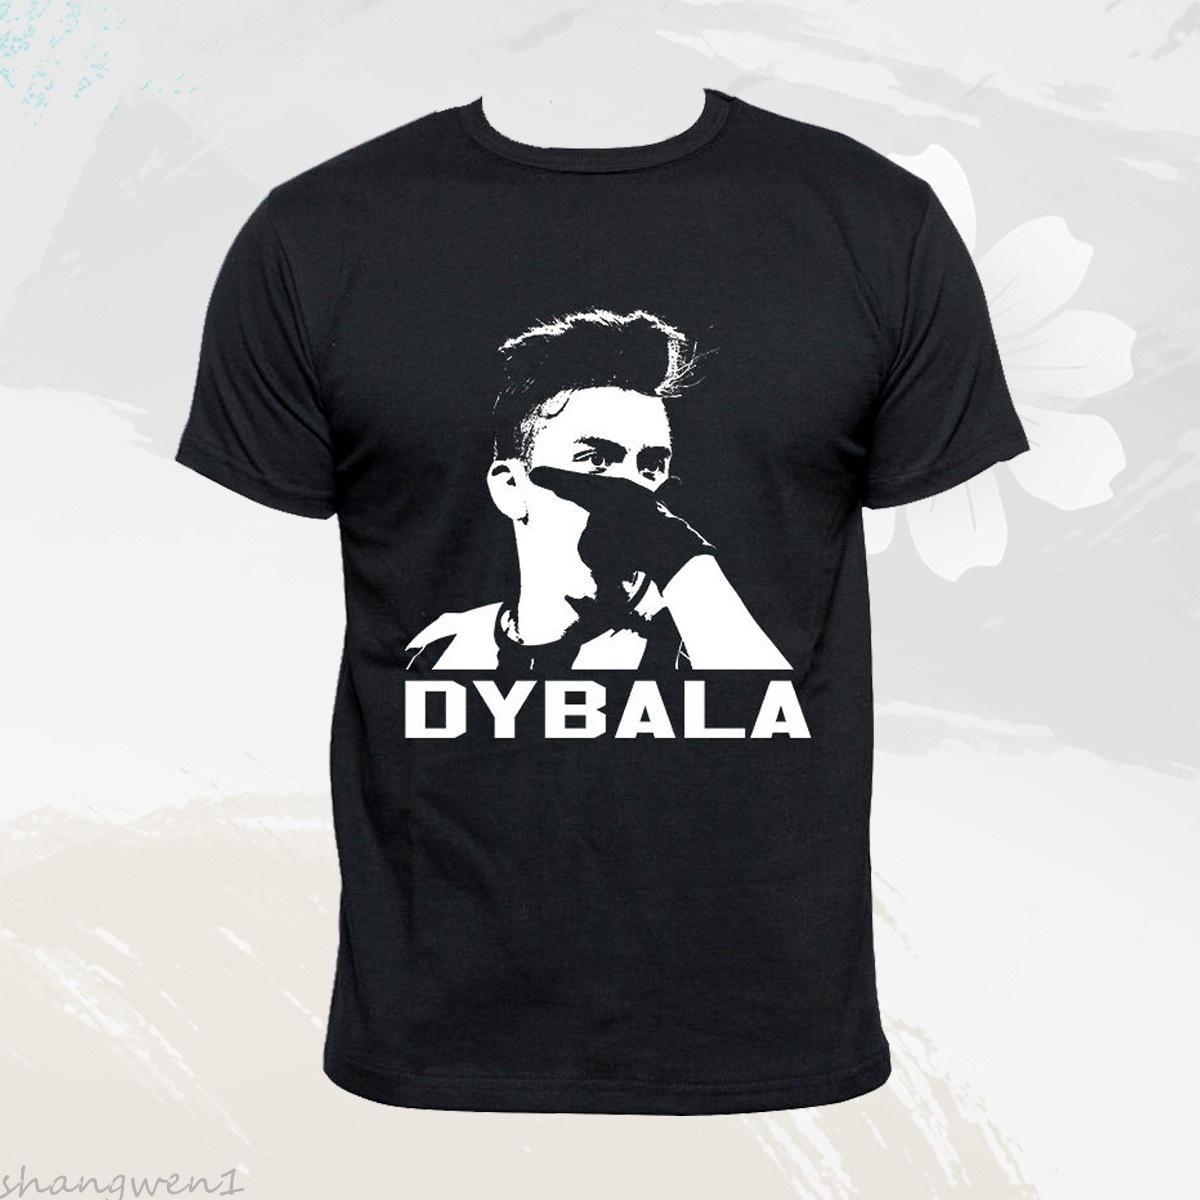 3e256da14 Juventus Football Club S.P.A Paulo Dybala Black Graphic Tee Shirt Mens  Short Sleeves Tops Clothing